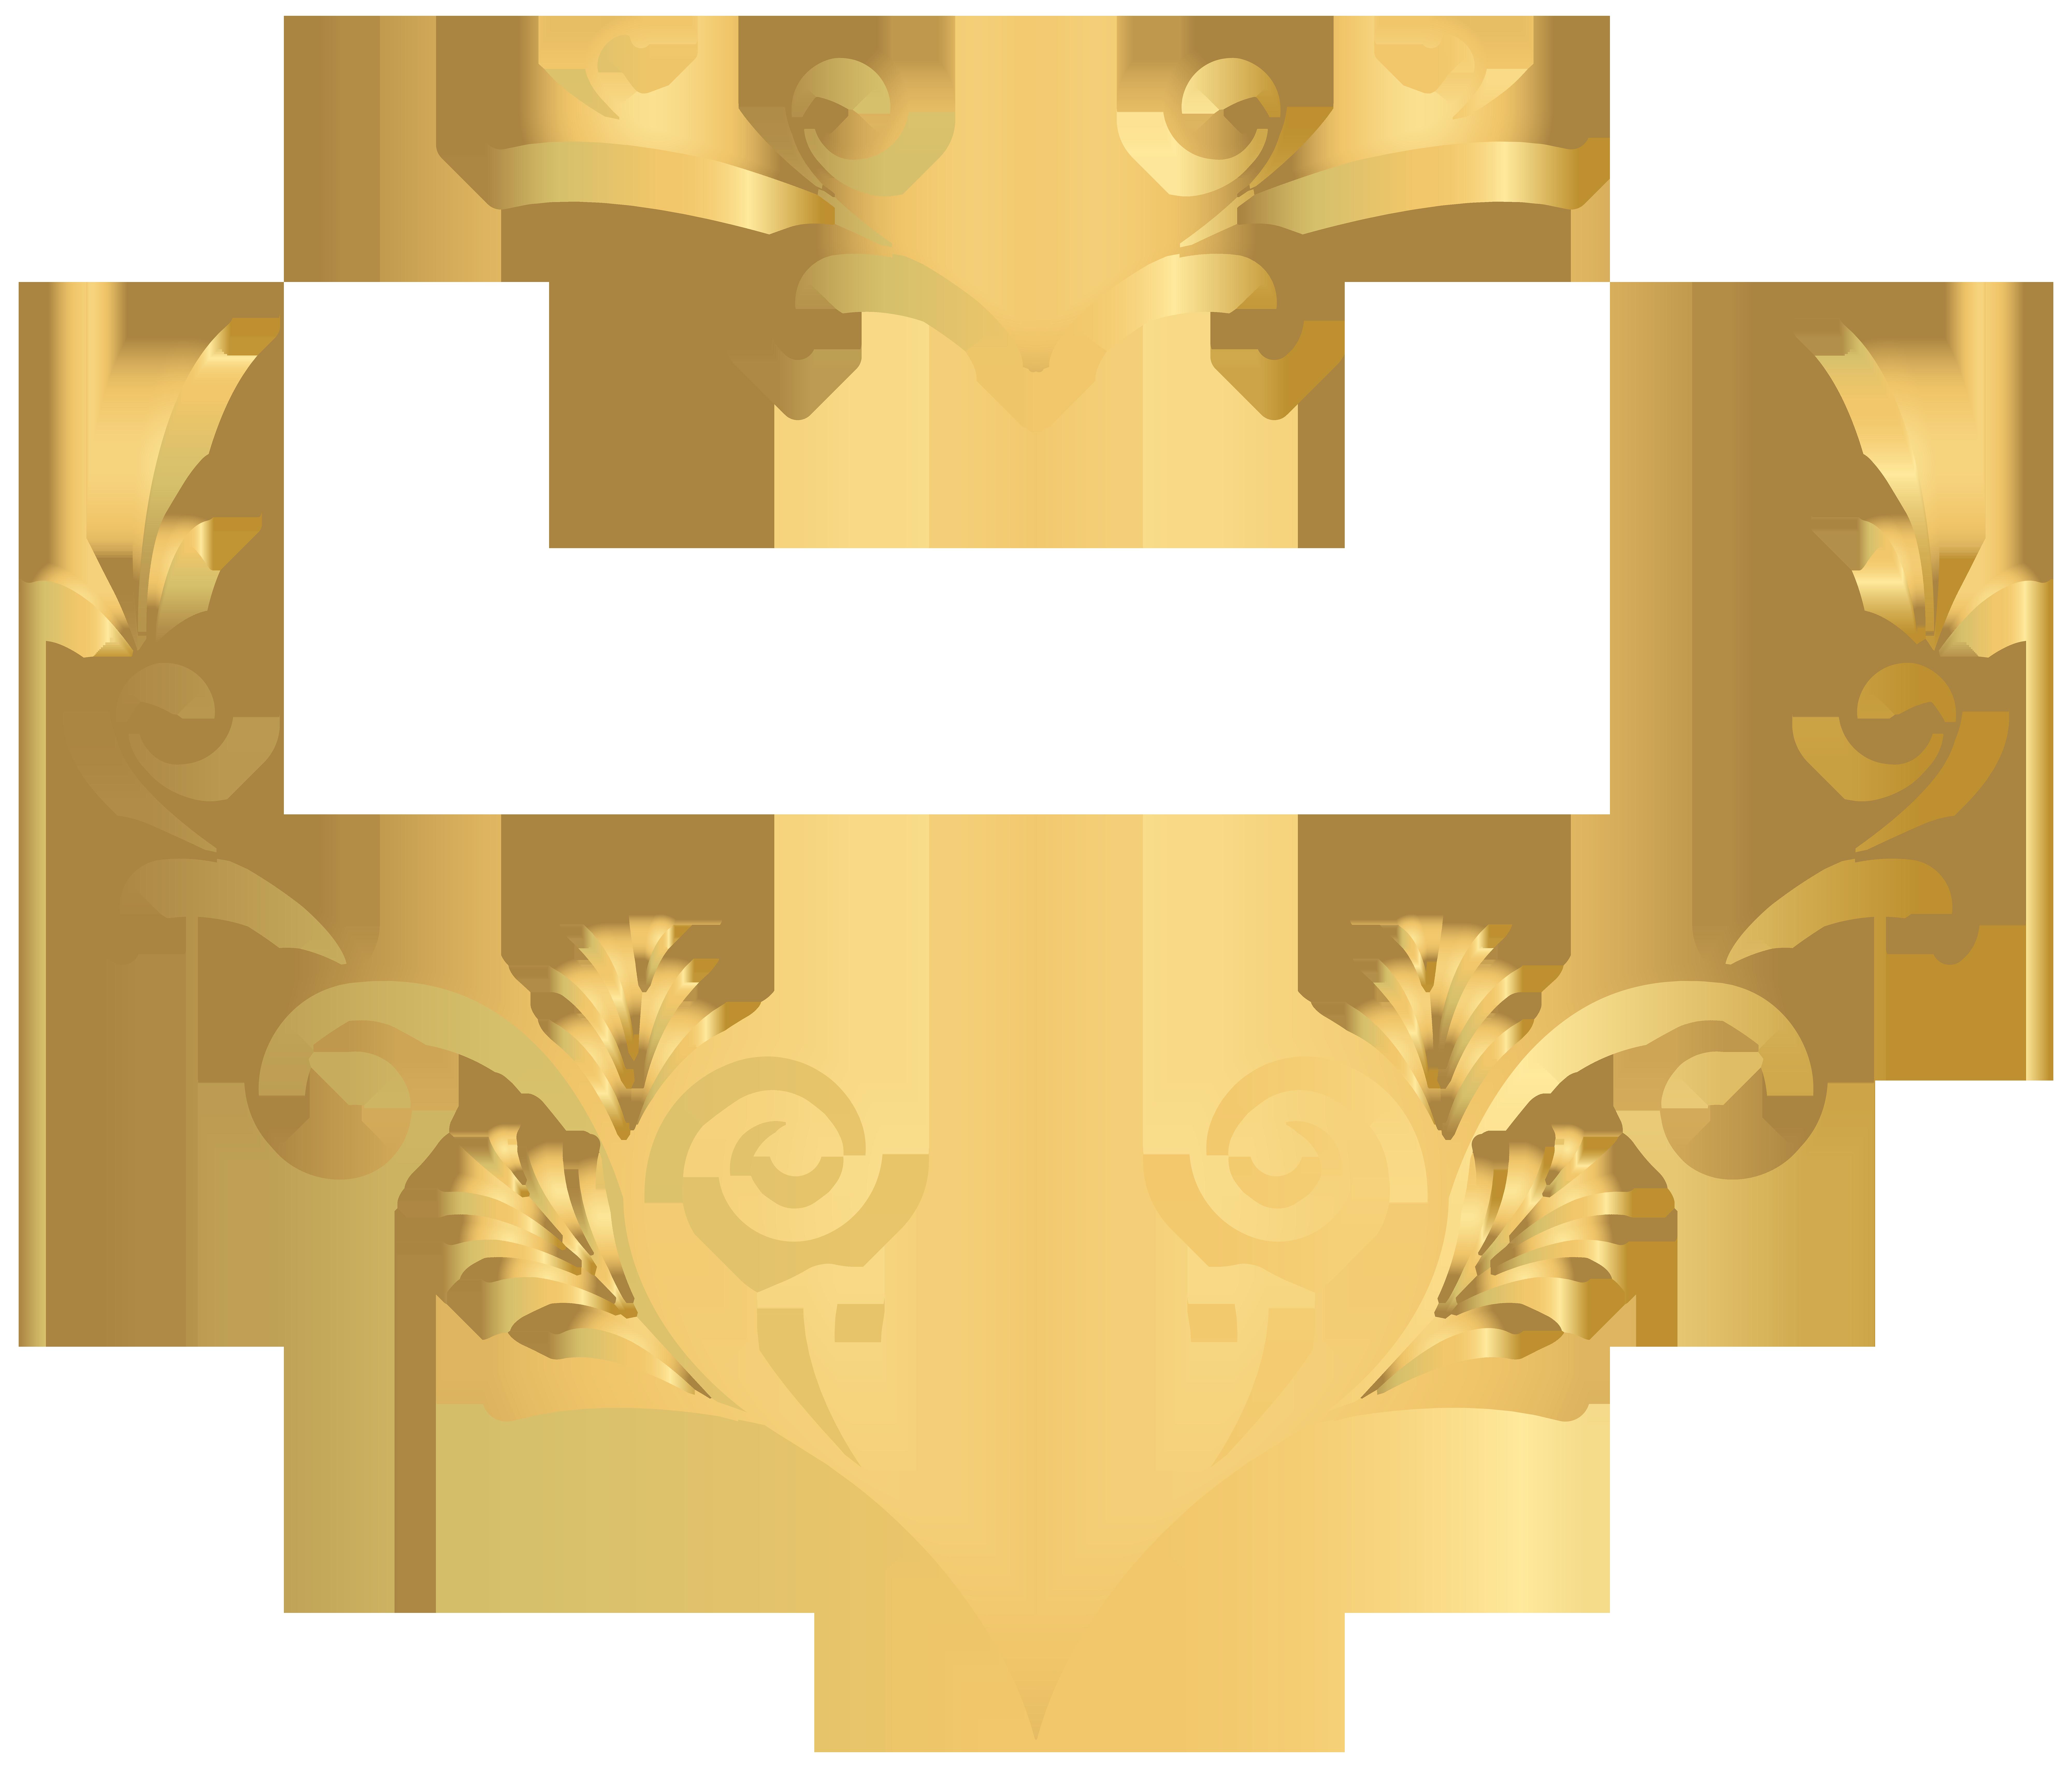 Clipart hearts decoration. Decorative heart png clip